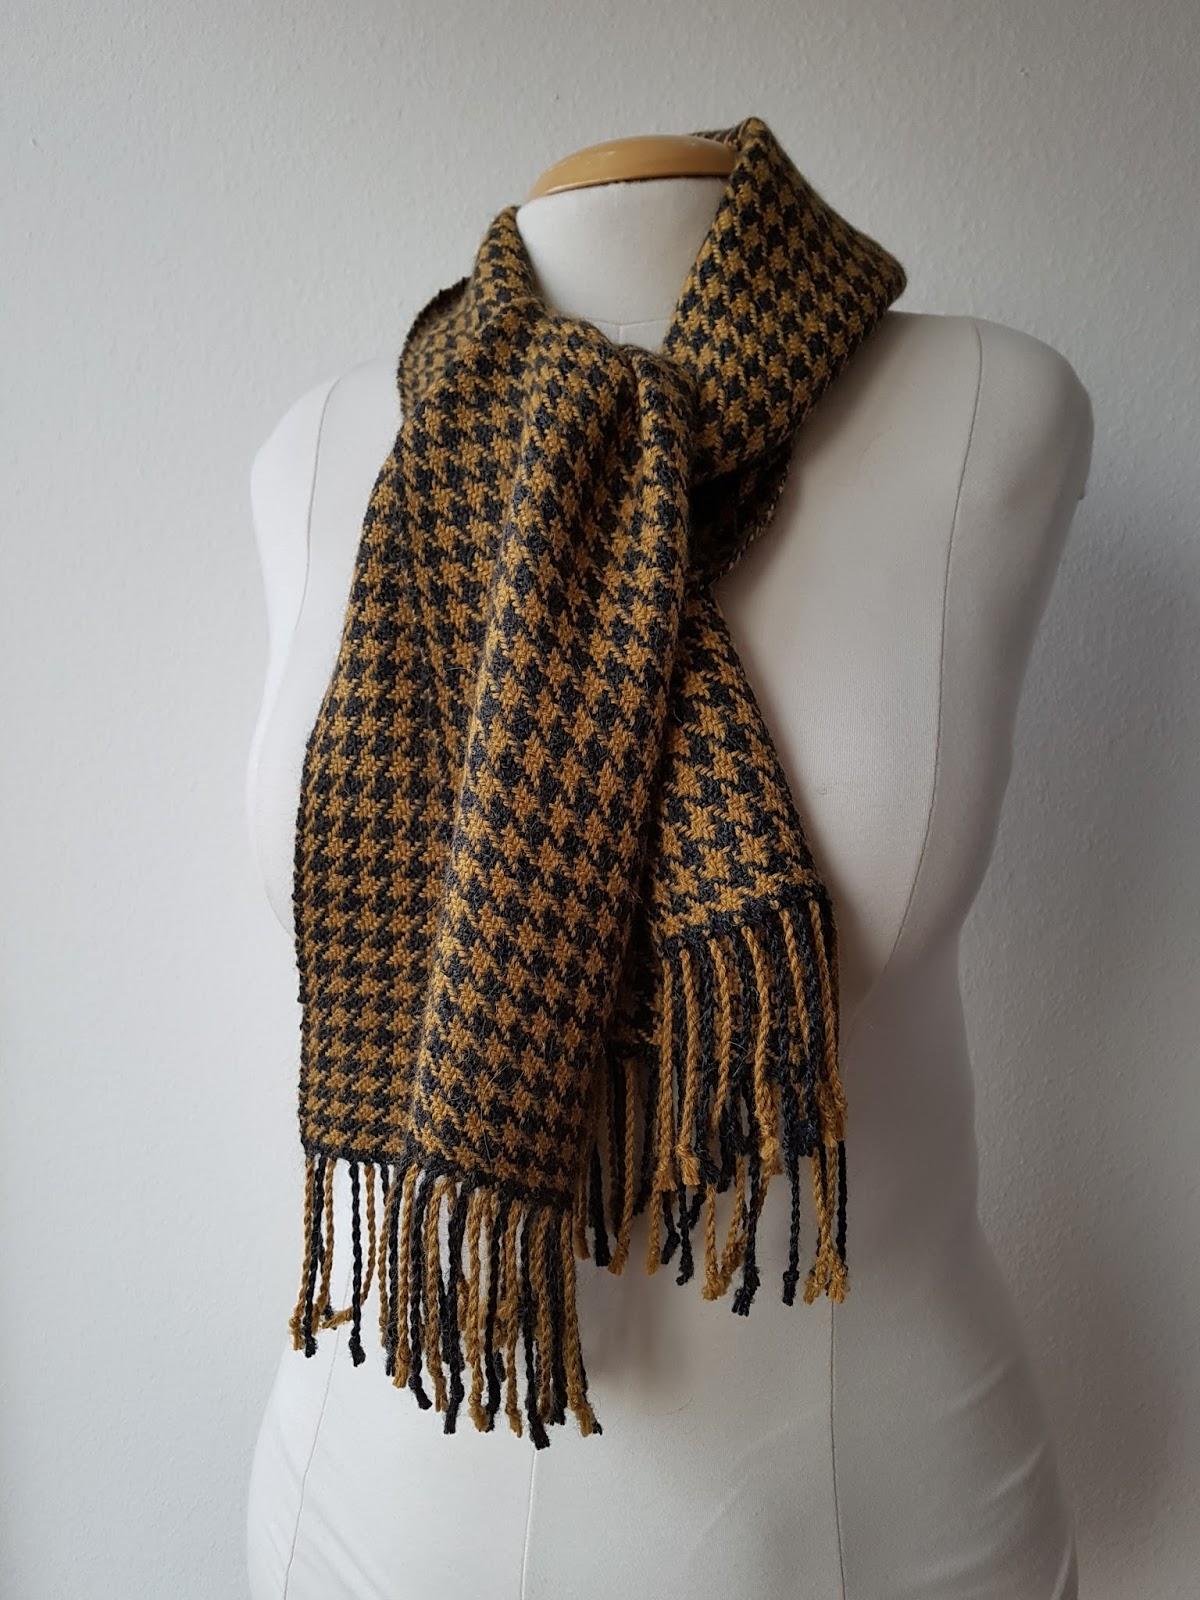 Monkeyroom: Making scarves